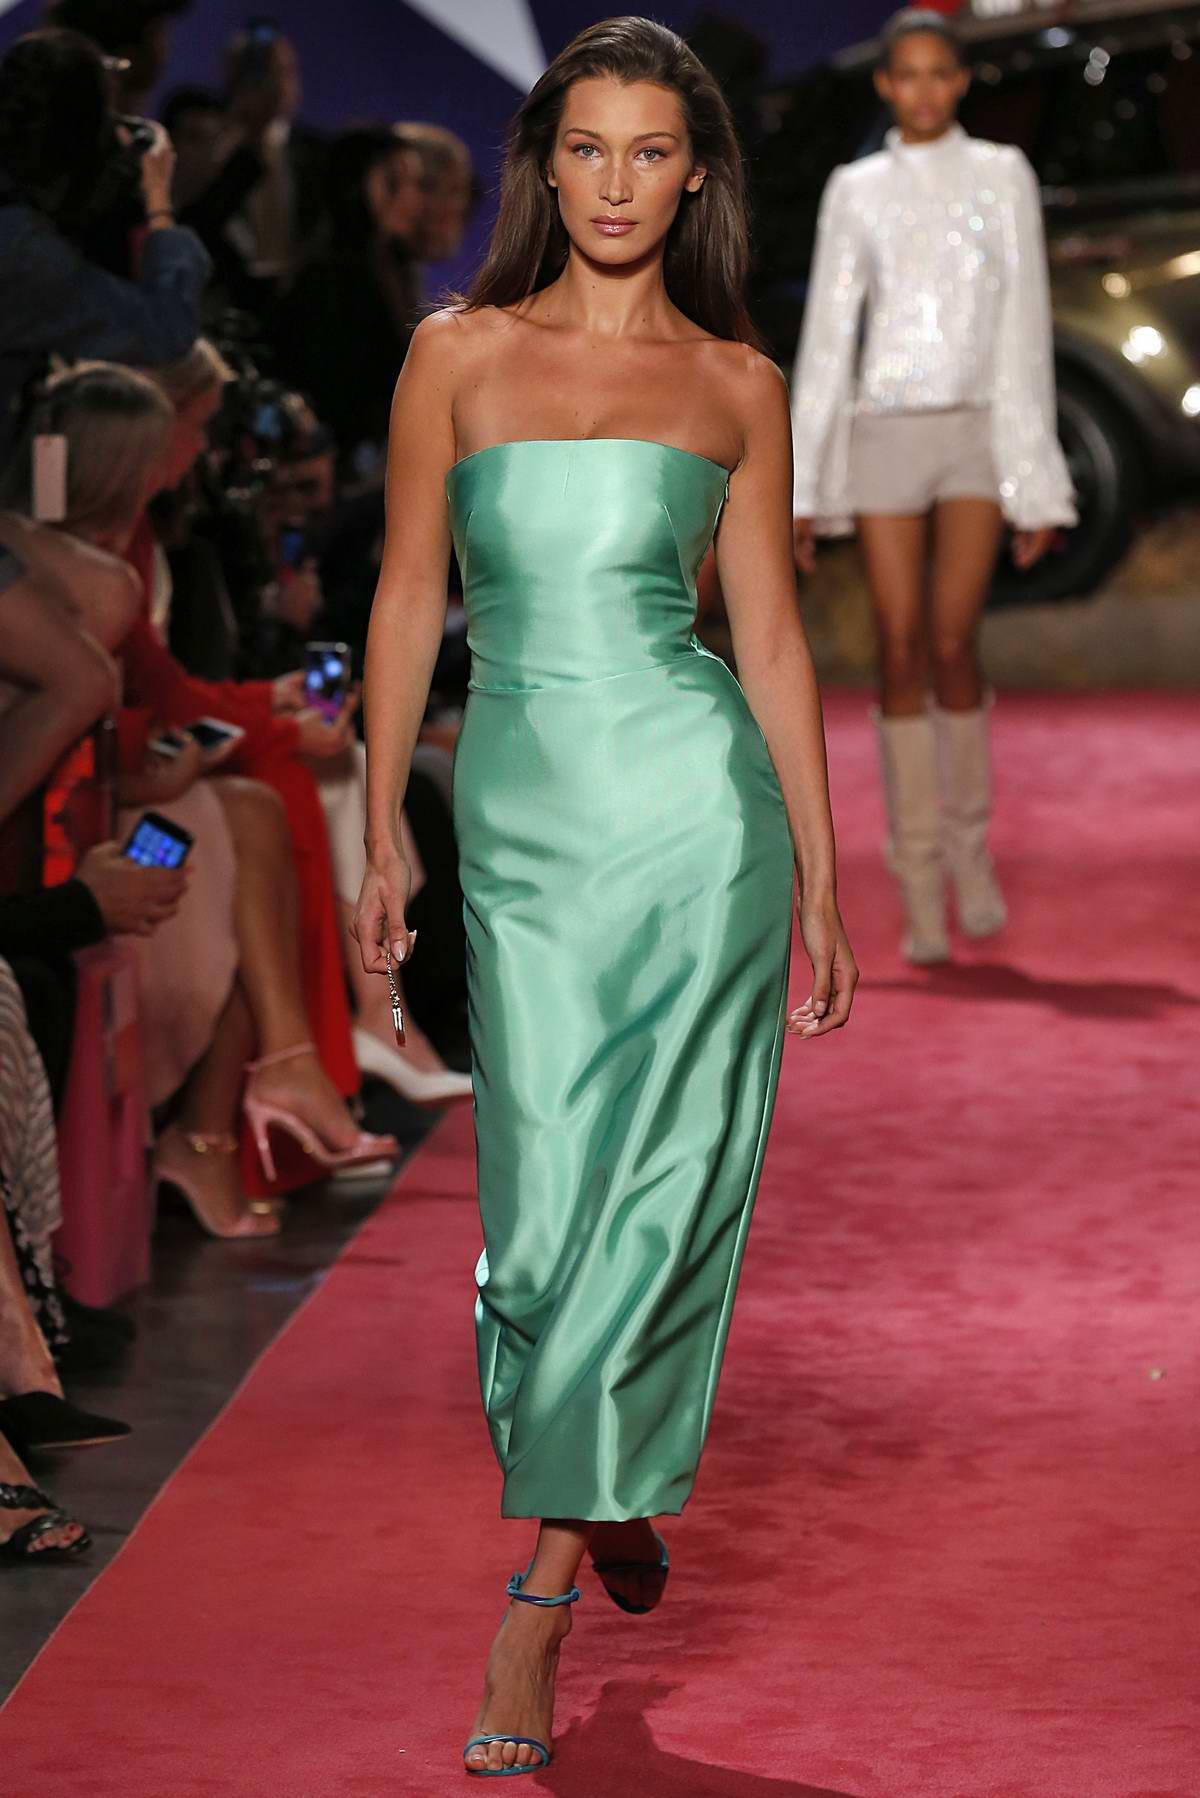 Bella Hadid walks on the runway for Brandon Maxwell Spring/Summer 2019 Fashion Show during New York Fashion Week in New York City